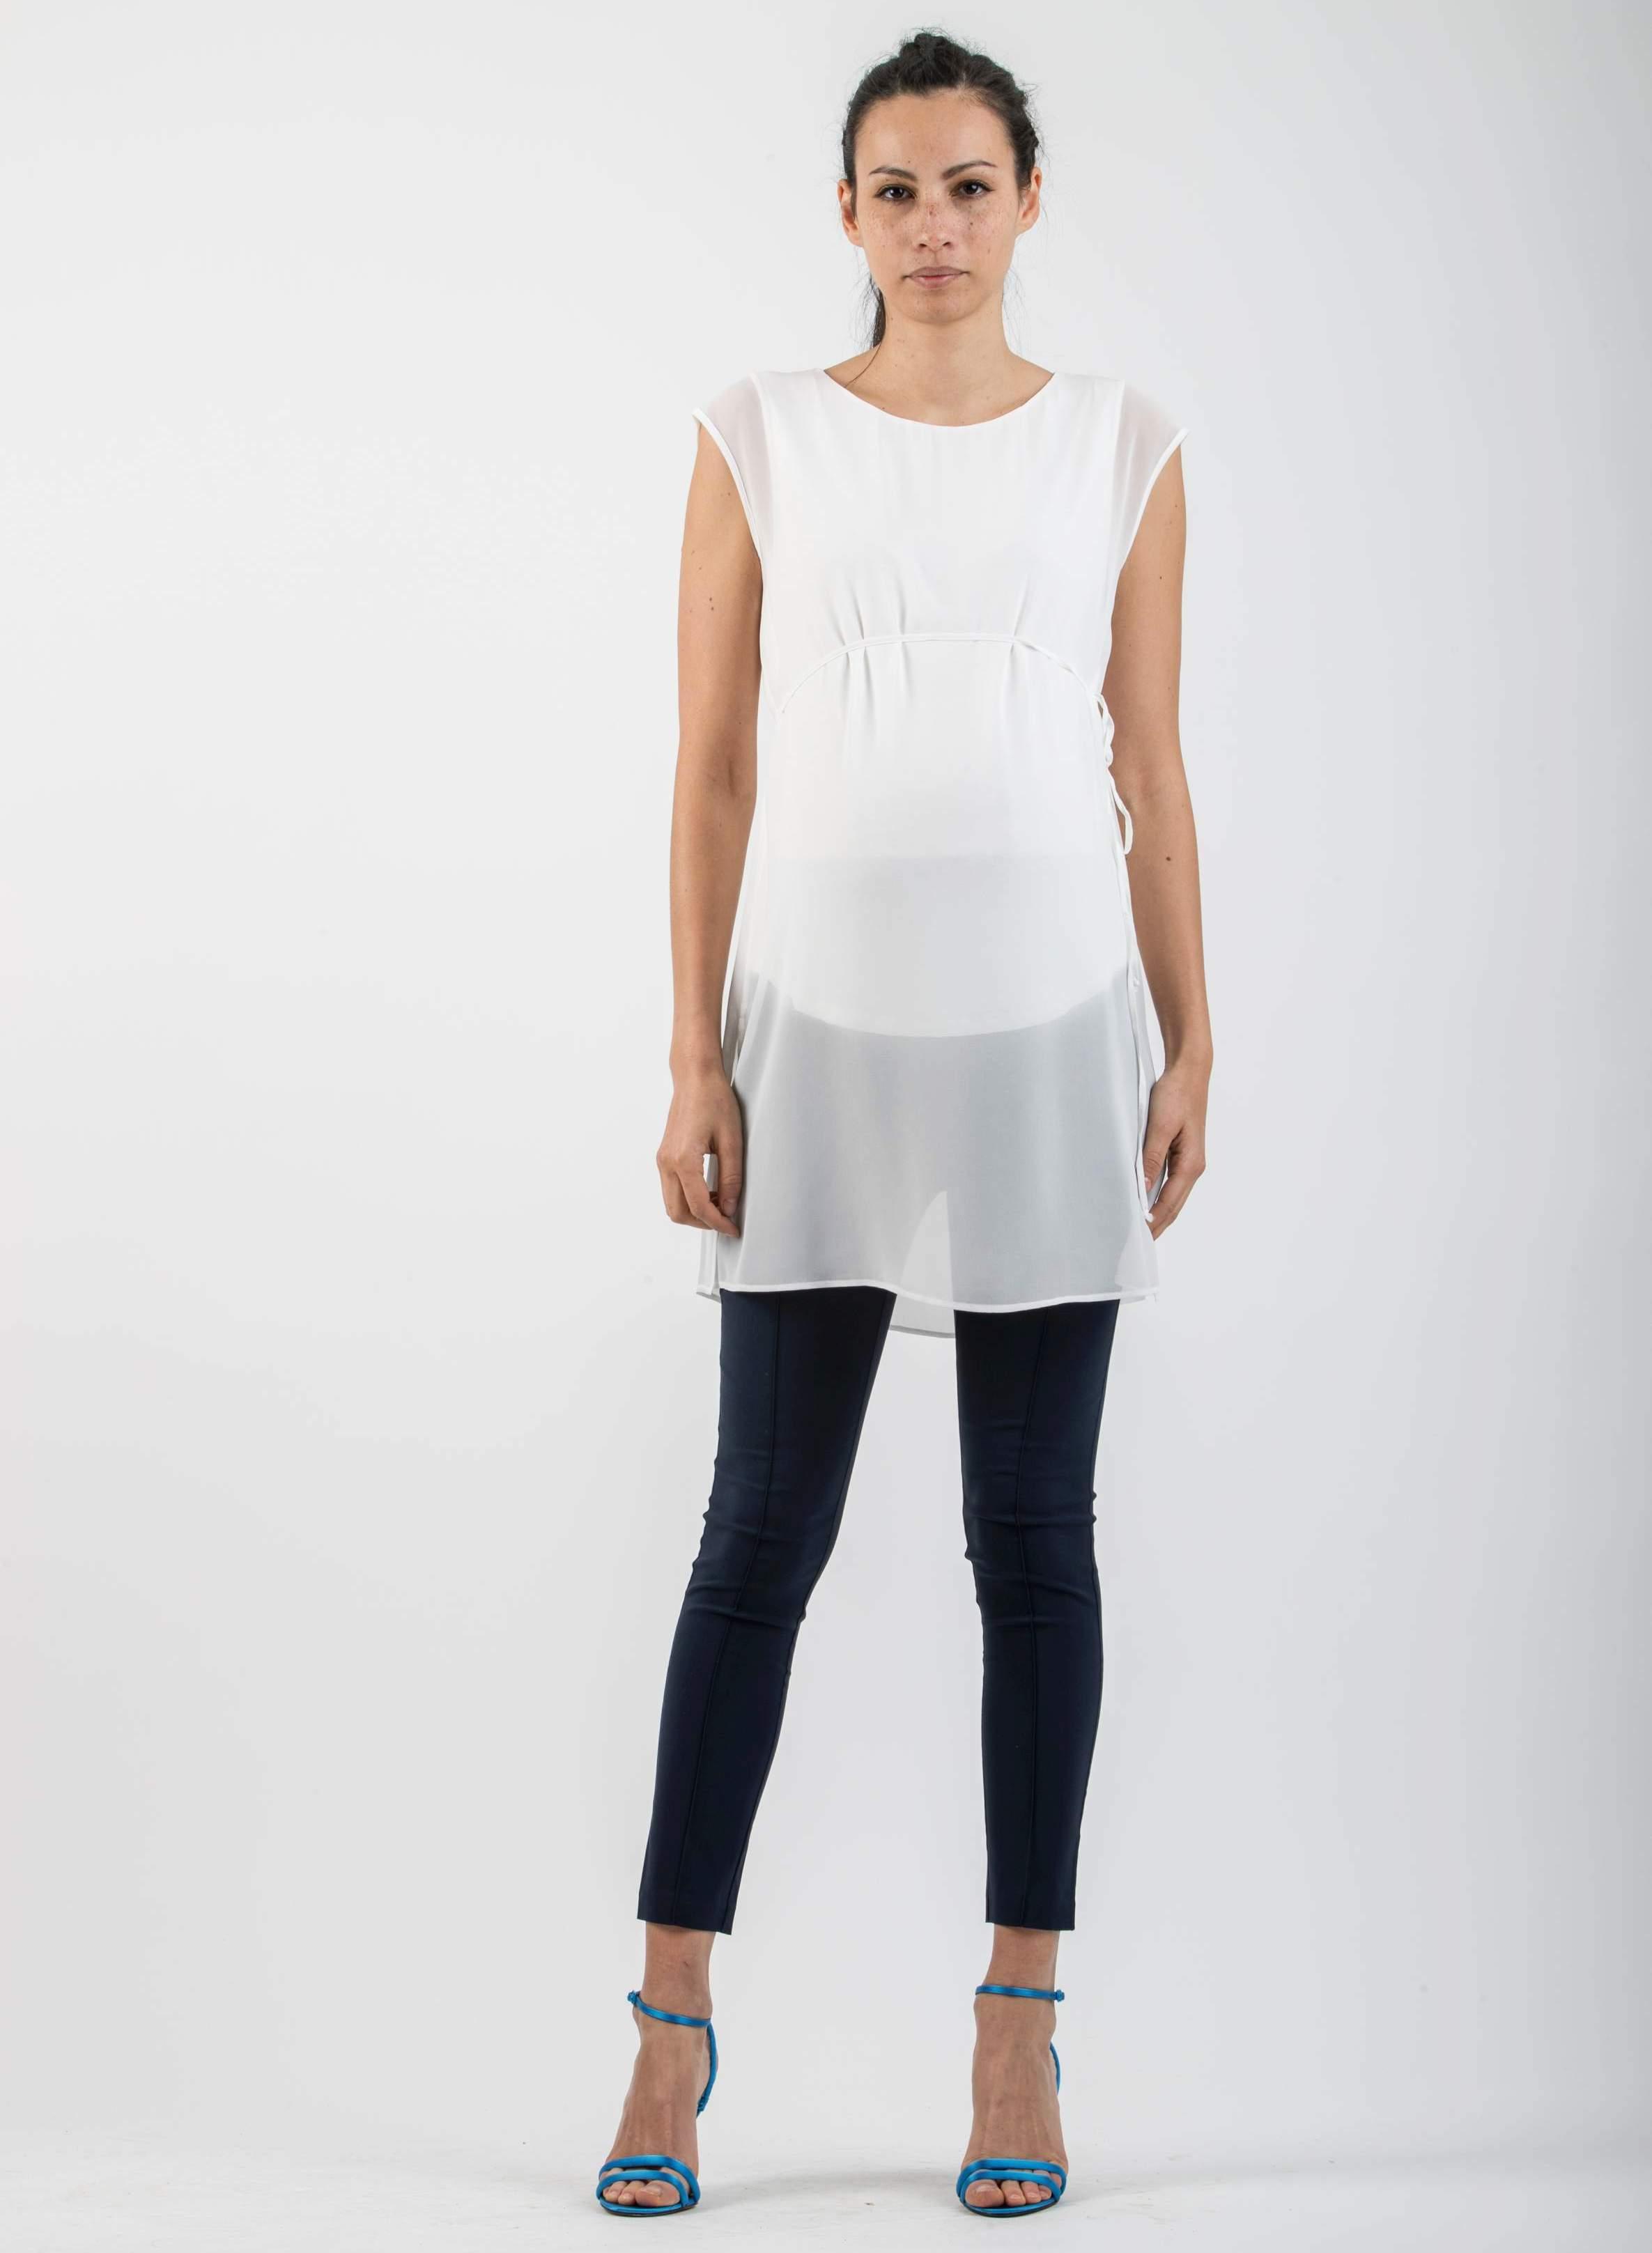 fe2fe9233d8b Home · Shop Online · Abbigliamento · Pantaloni · Leggings Premaman in  Bengalina Super-Stretch